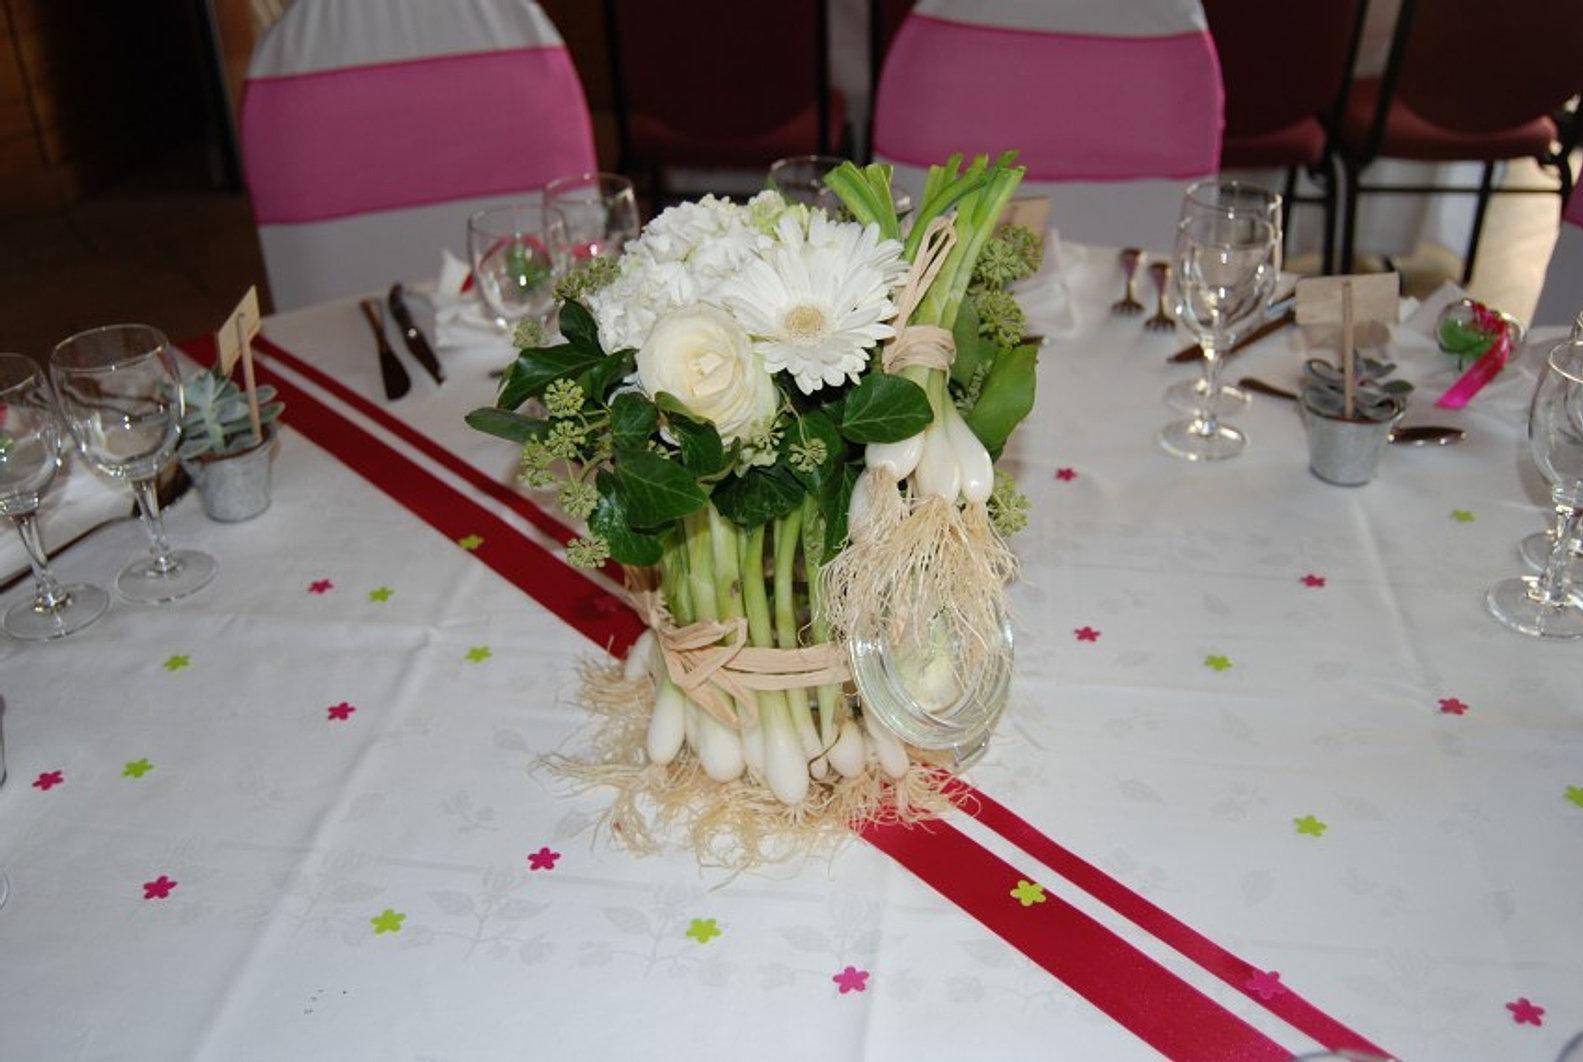 ... mariage fleuriste auxerre yonne 13 jpg fleuriste mariage auxerre yonne